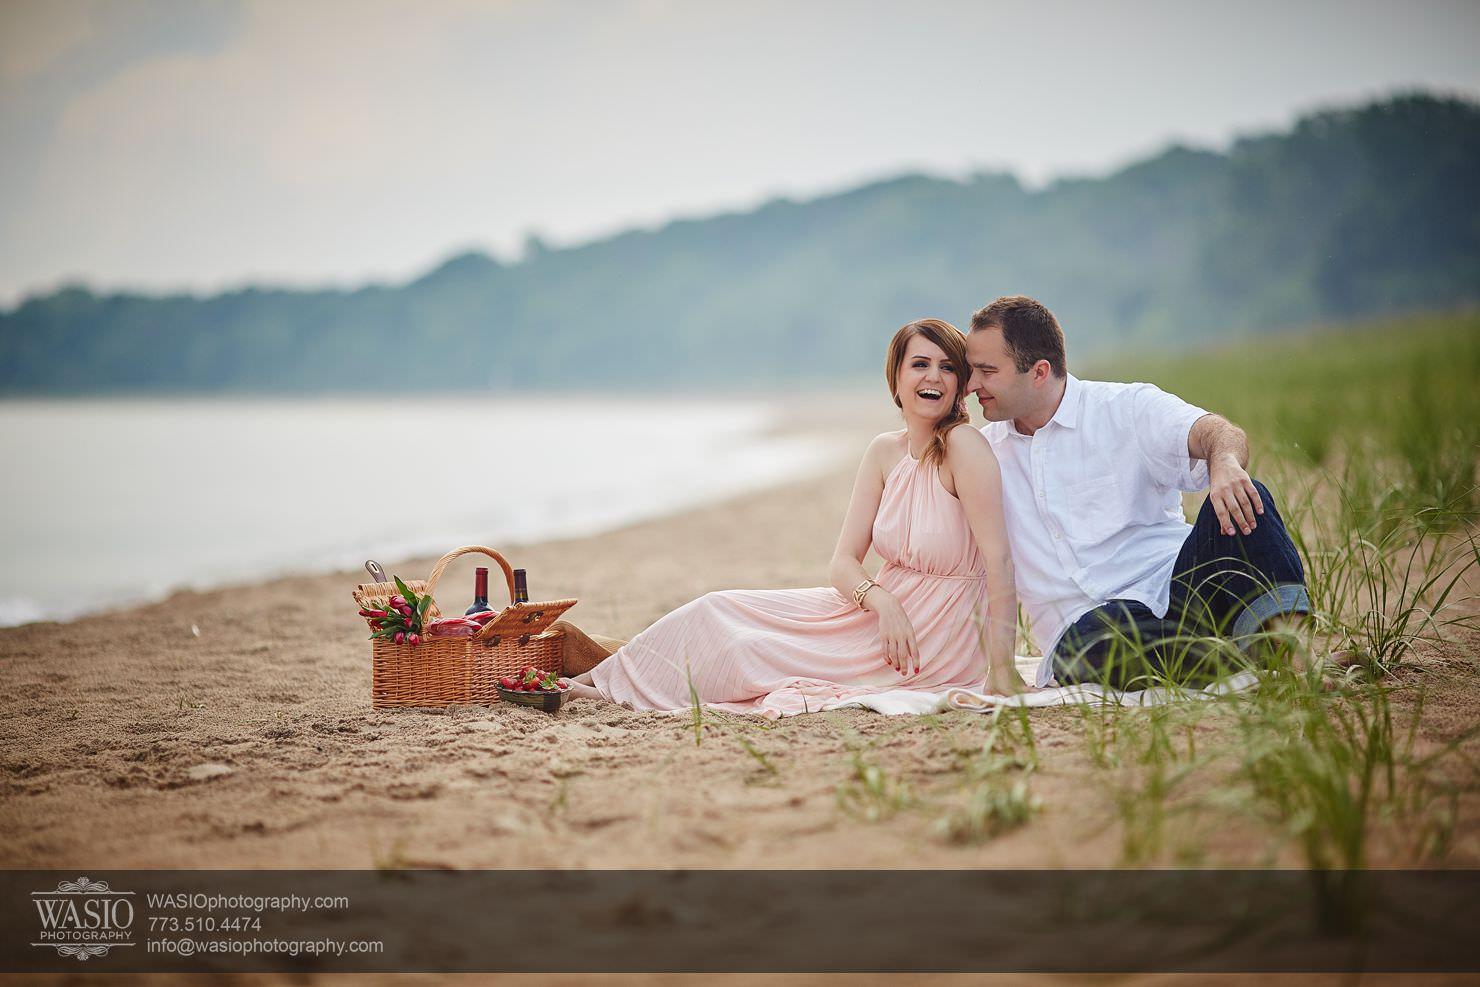 Michigan Engagement – Ewa & Marek